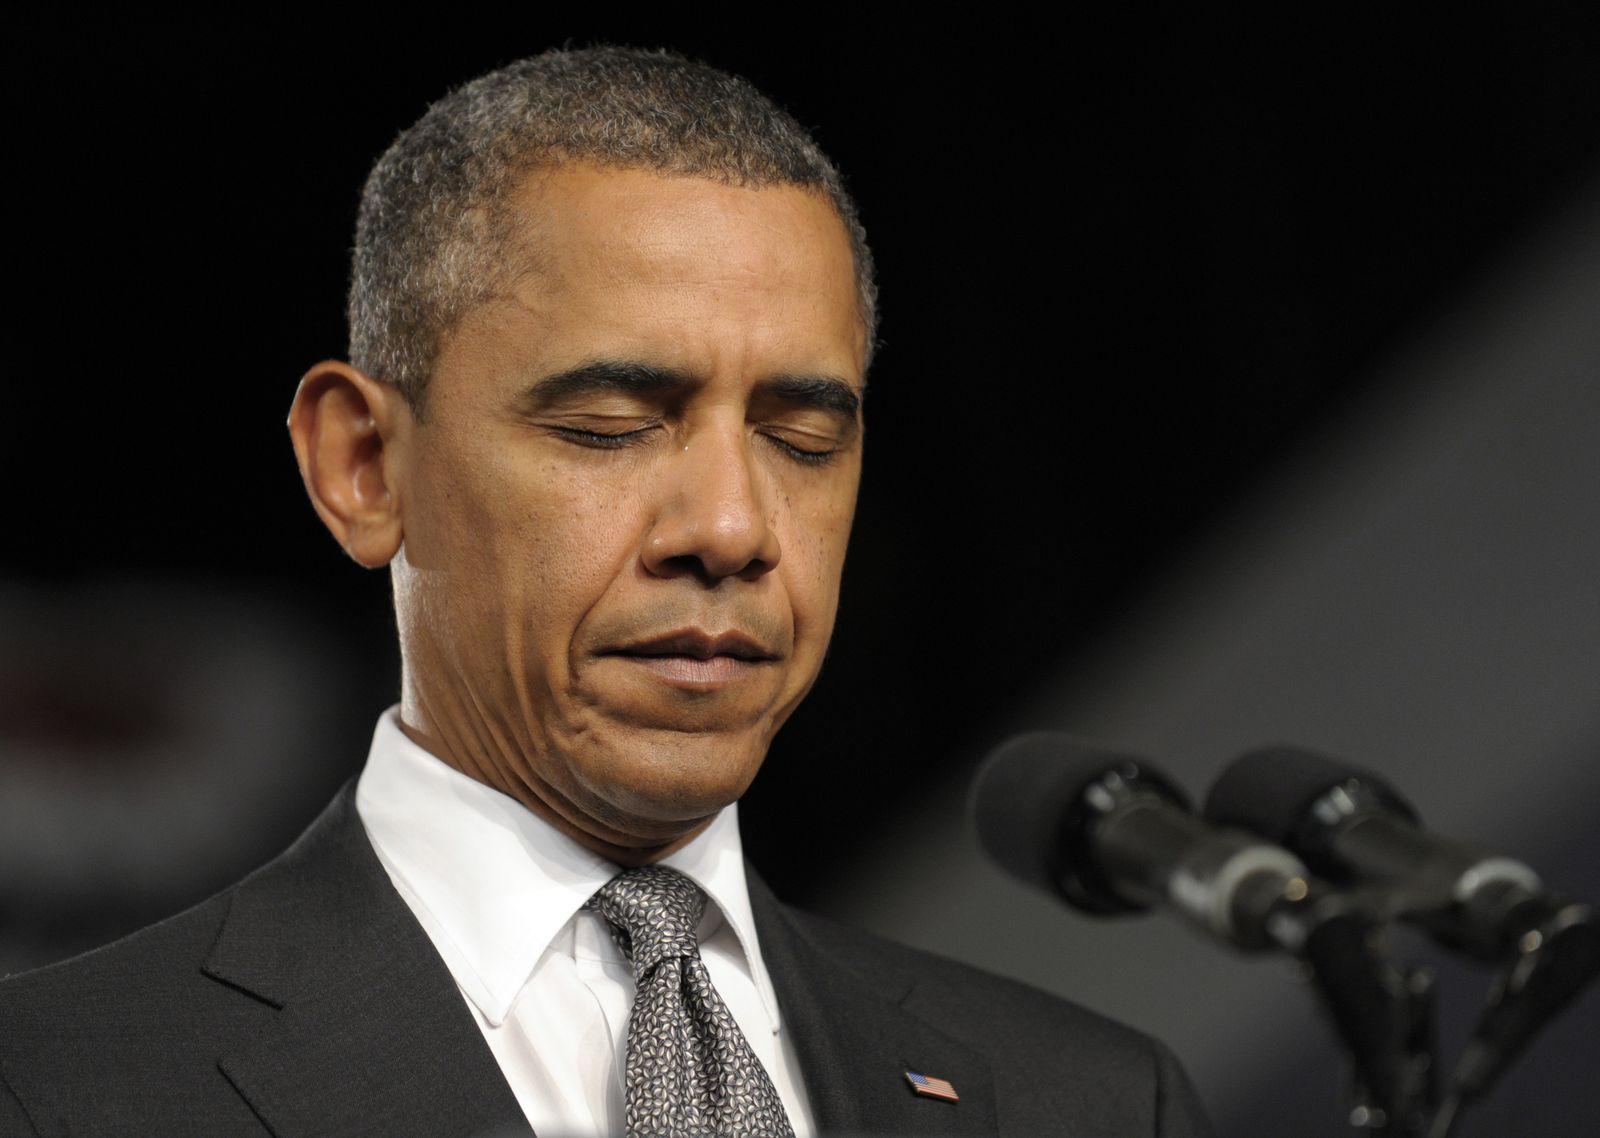 Barack Obama Schießerei Denver